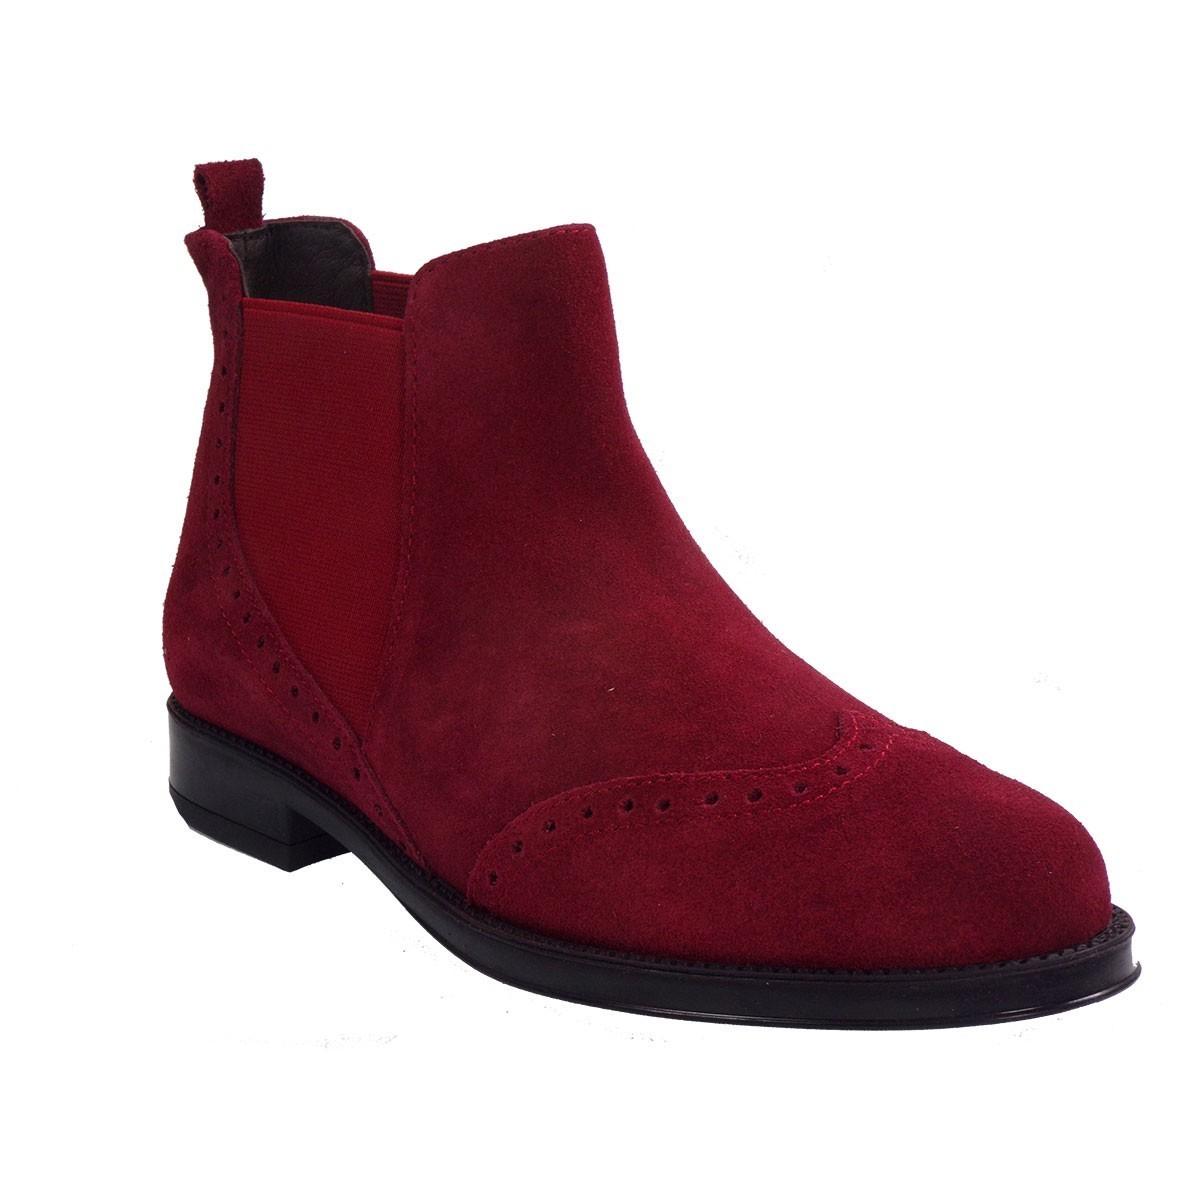 VEROSOFT Γυναικεία Παπούτσια Μποτάκια Αστραγάλου PUSH D BYTTON 868280929 Μπορντώ Δέρμα